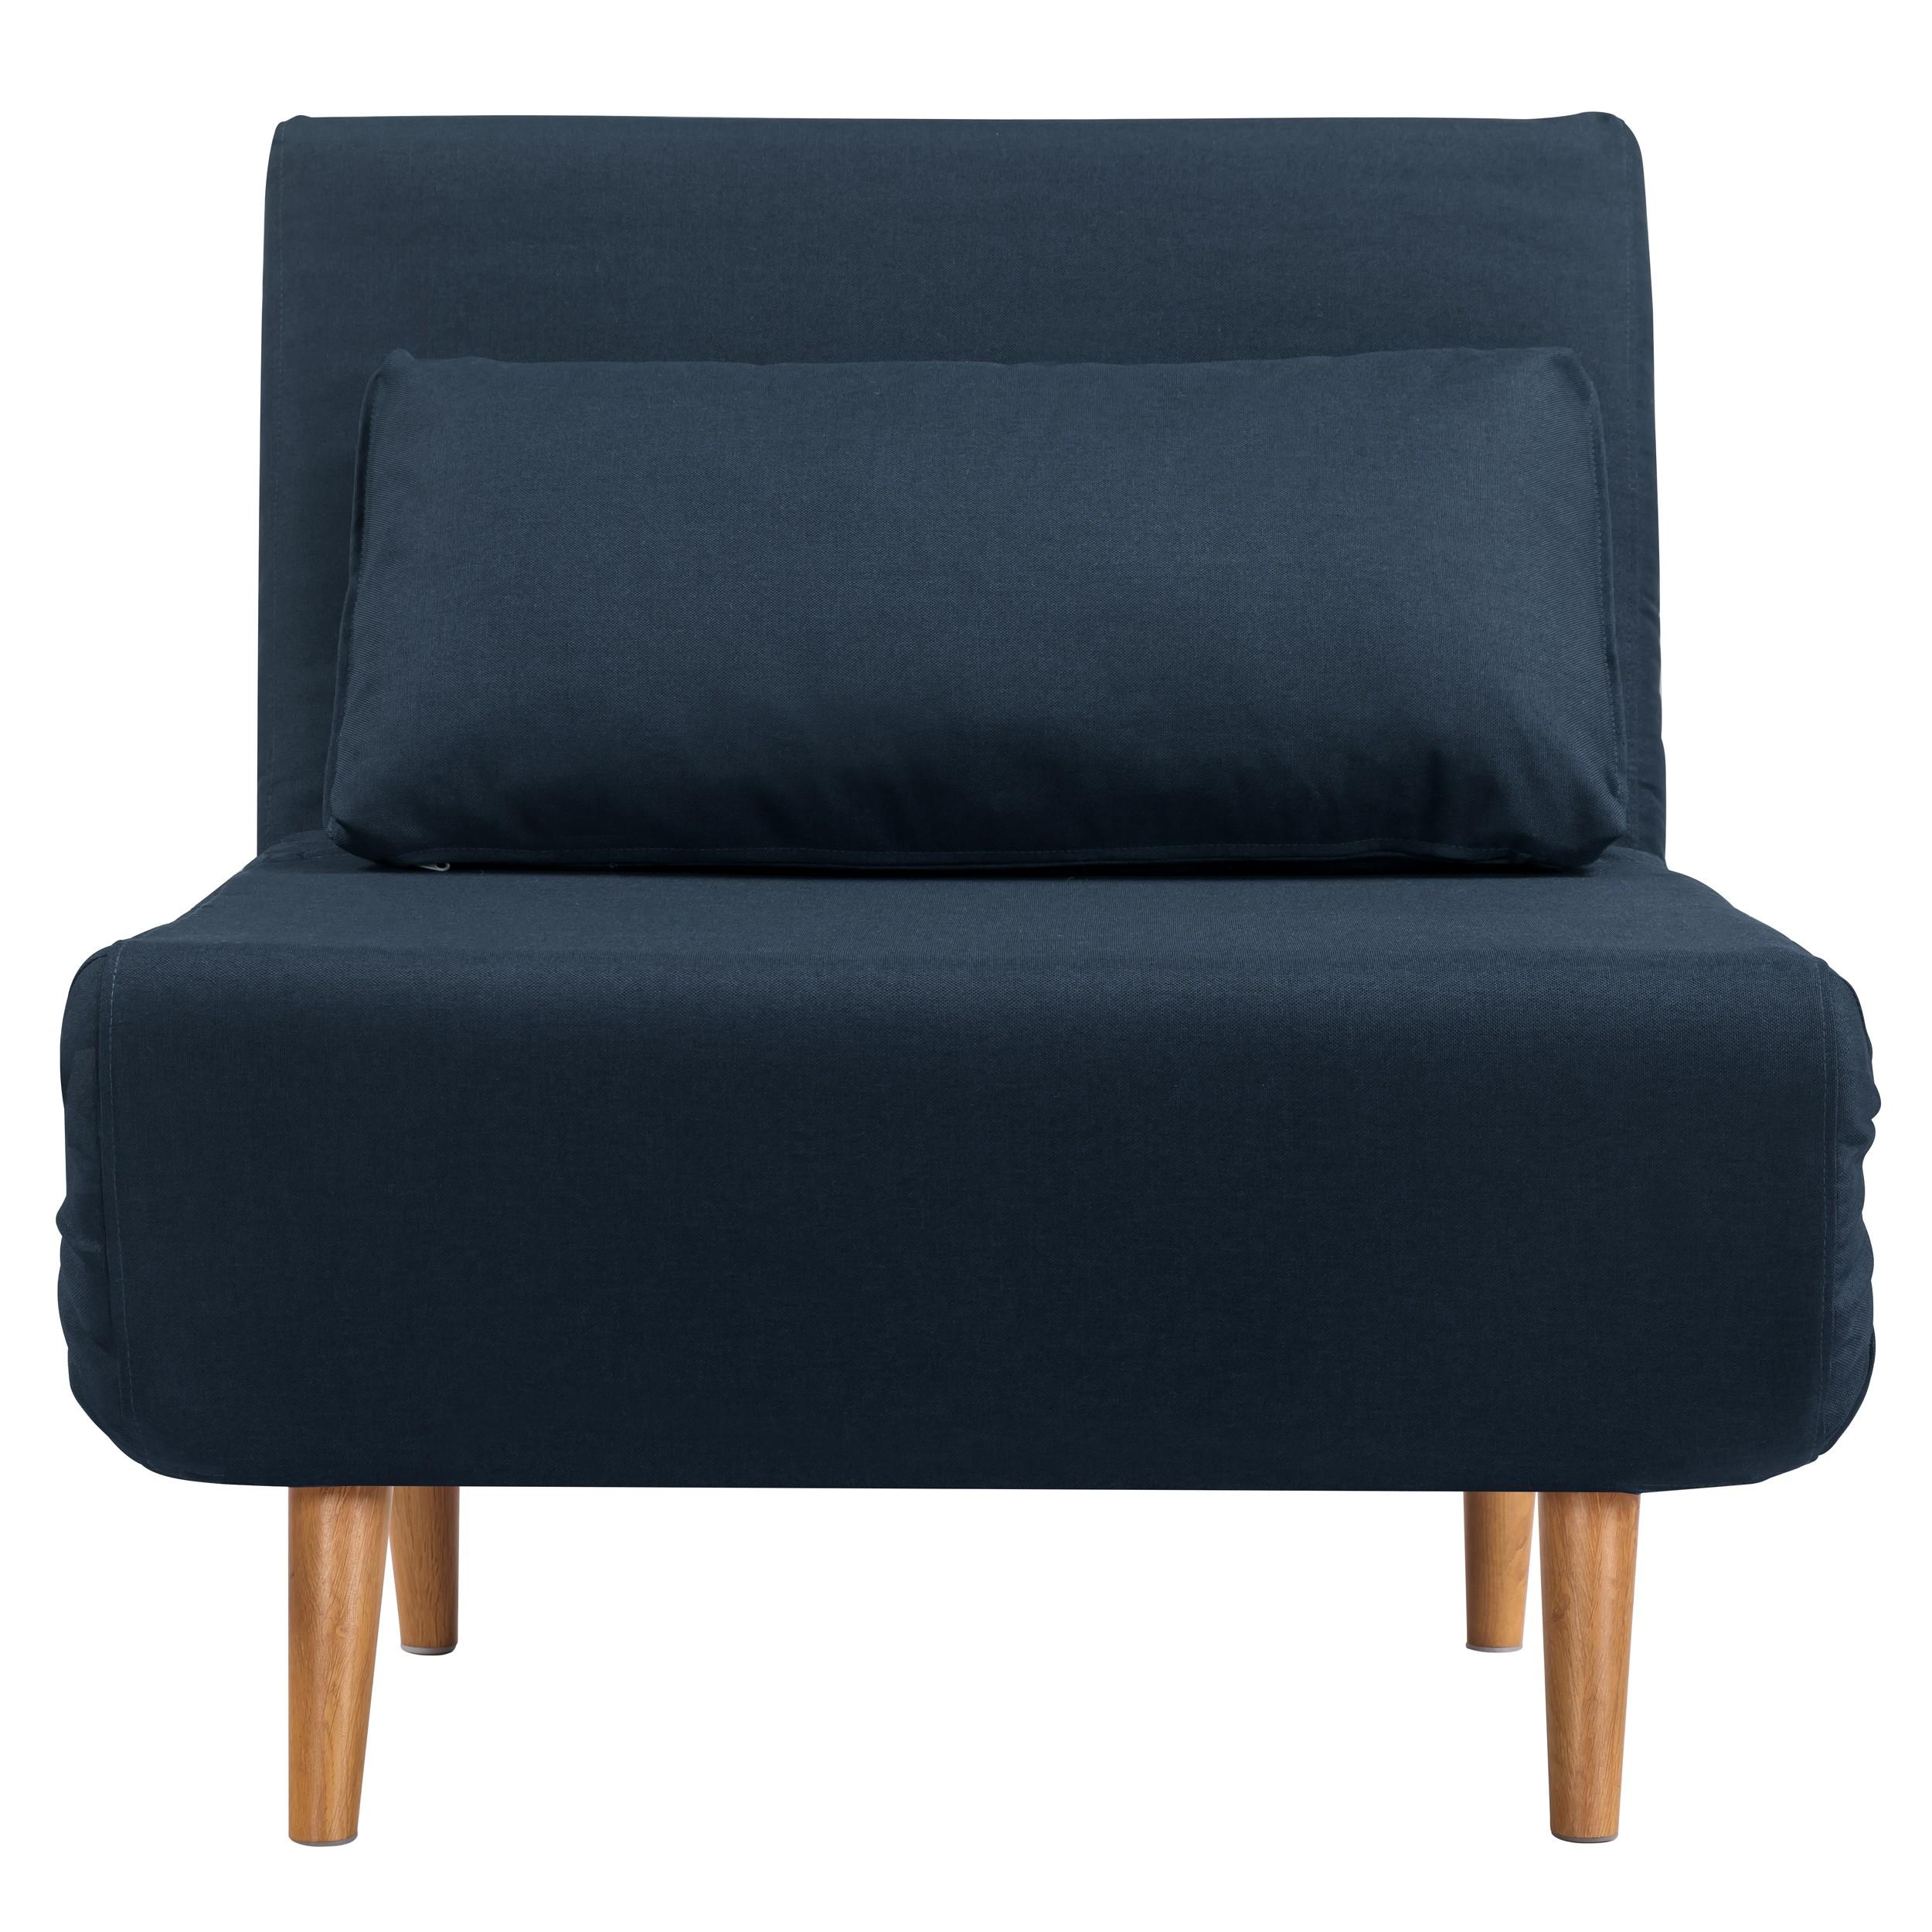 acheter fauteuil banquette bleu fonce